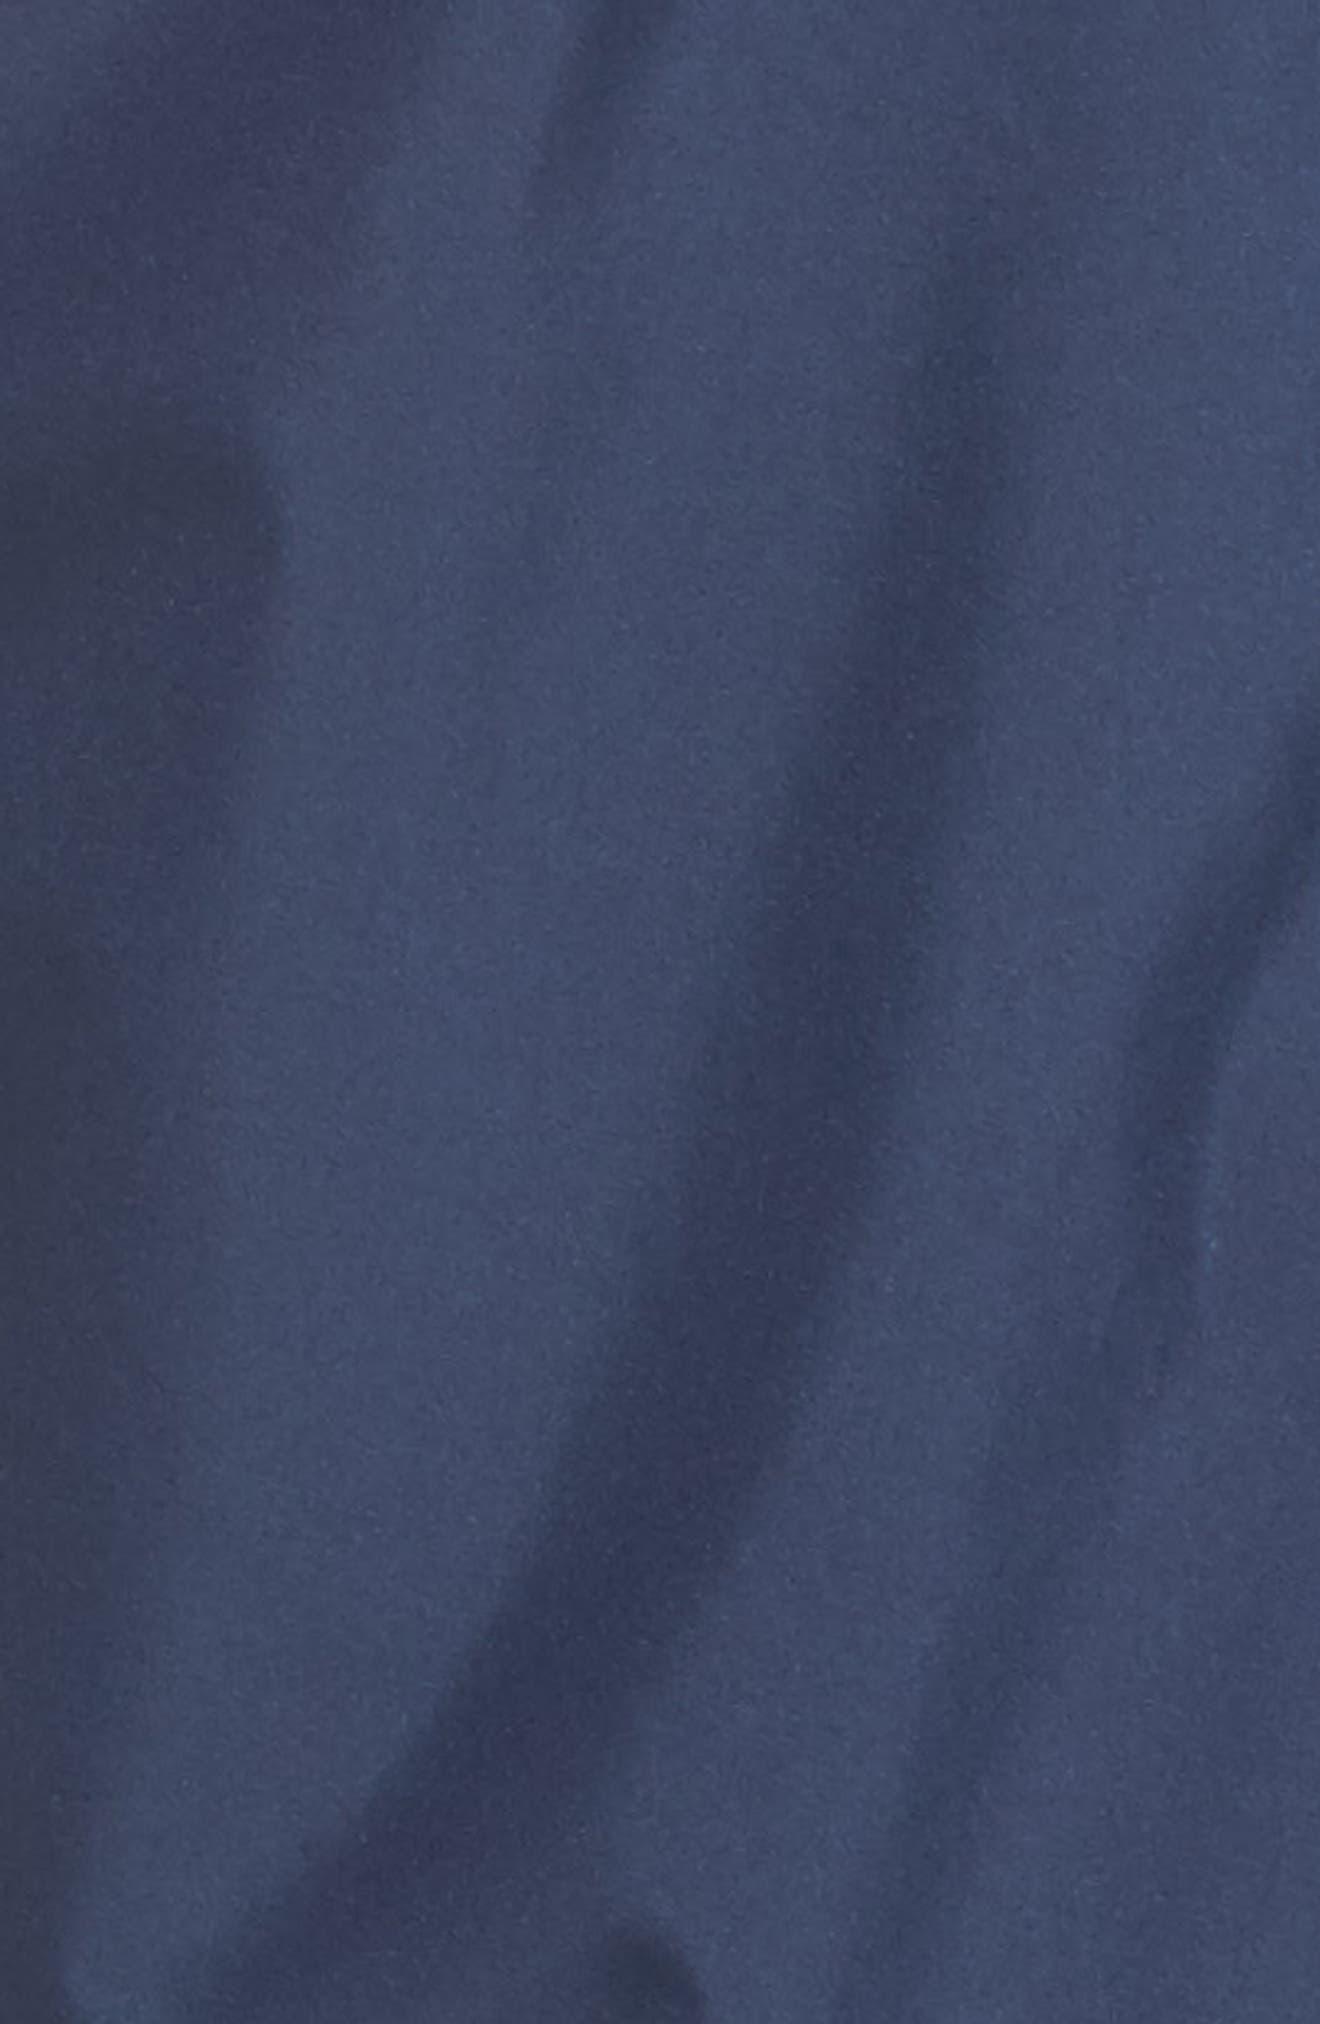 NFL Packable Water Resistant Jacket,                             Alternate thumbnail 6, color,                             College Navy/ Seahawks